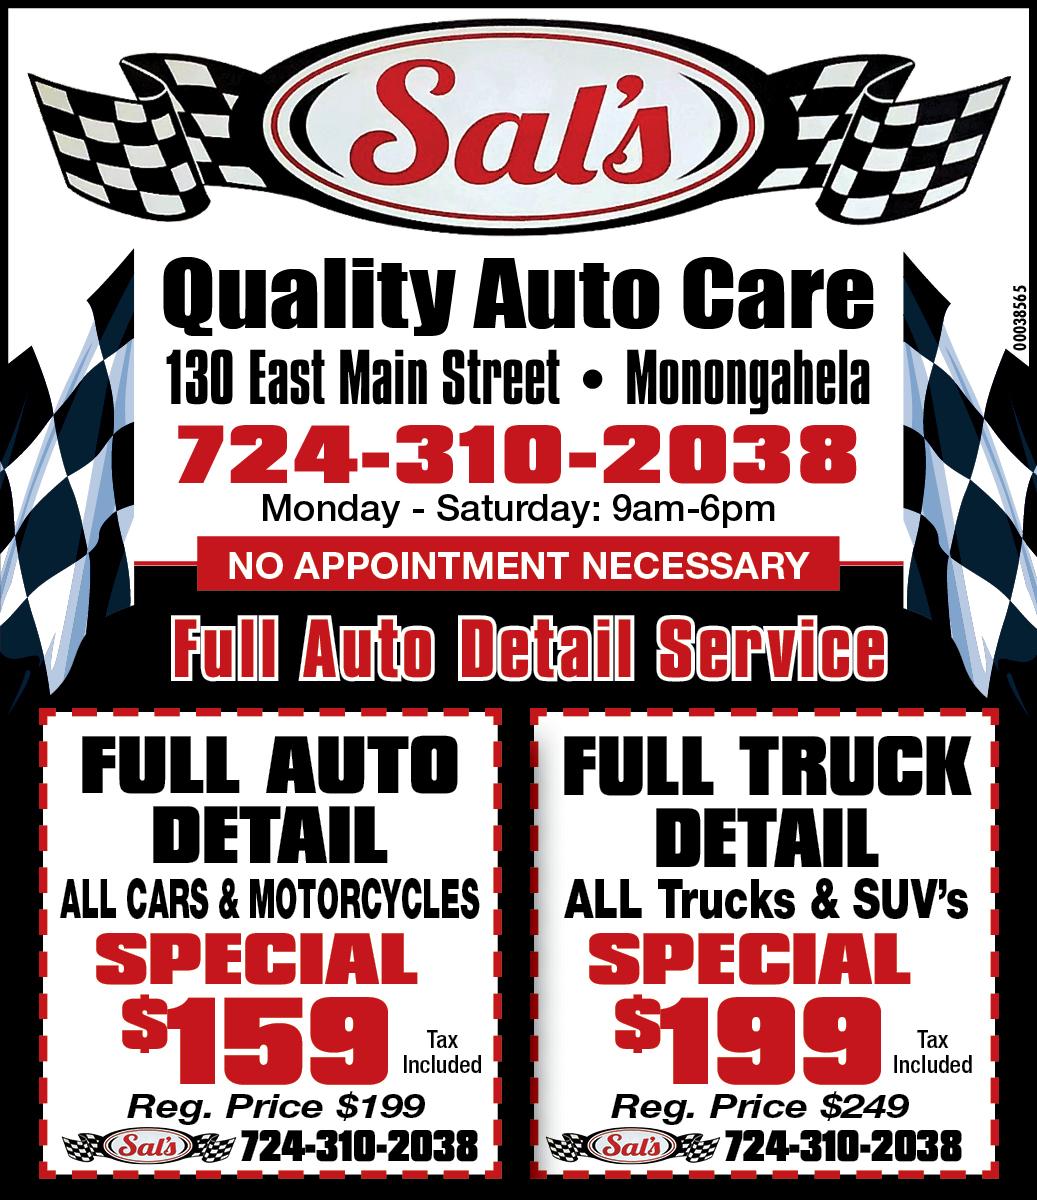 00038565_Sal's Quality Service